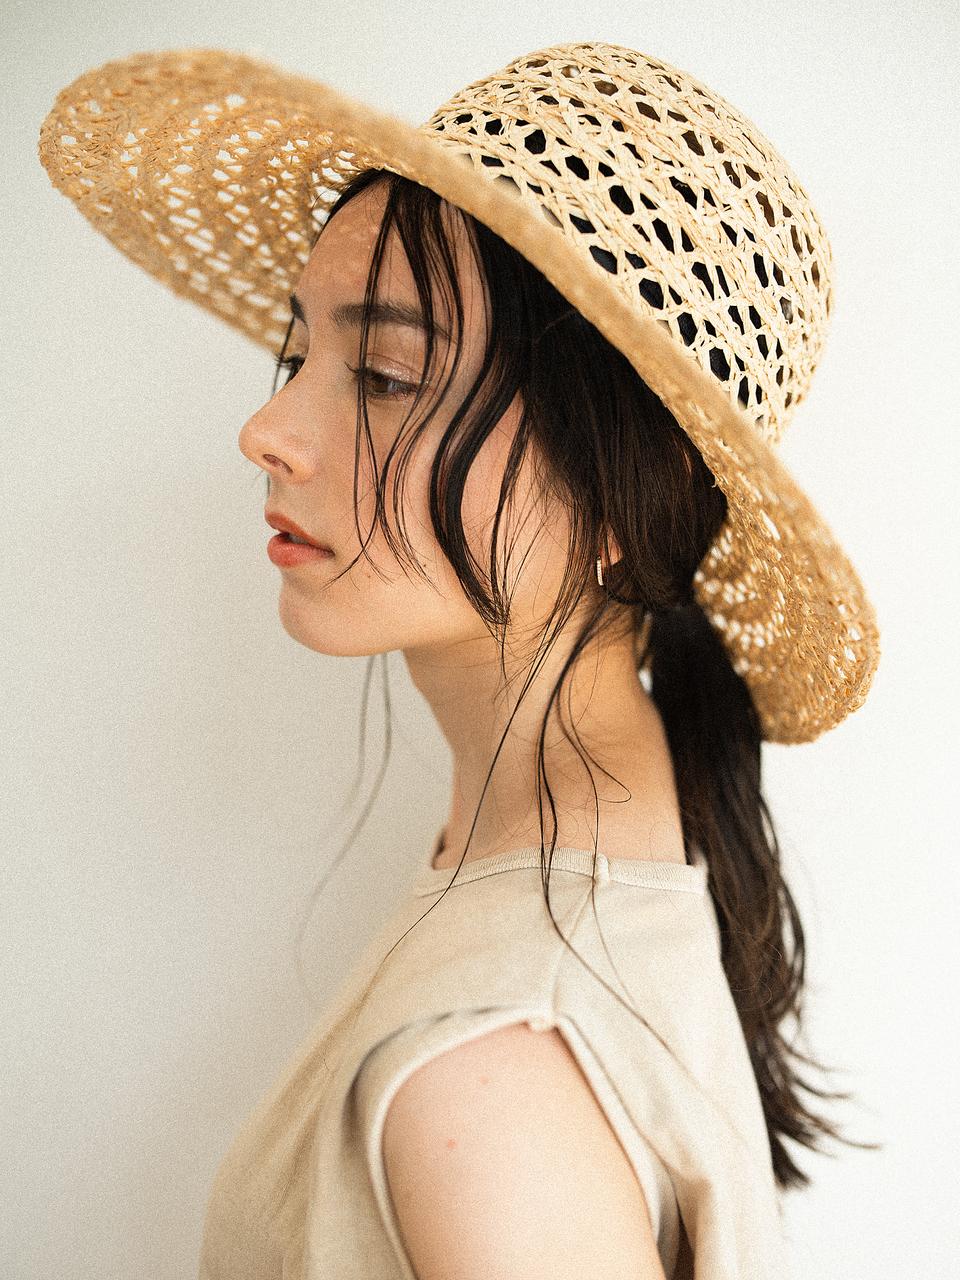 【Violet】麦わら帽子×ヘアアレンジ